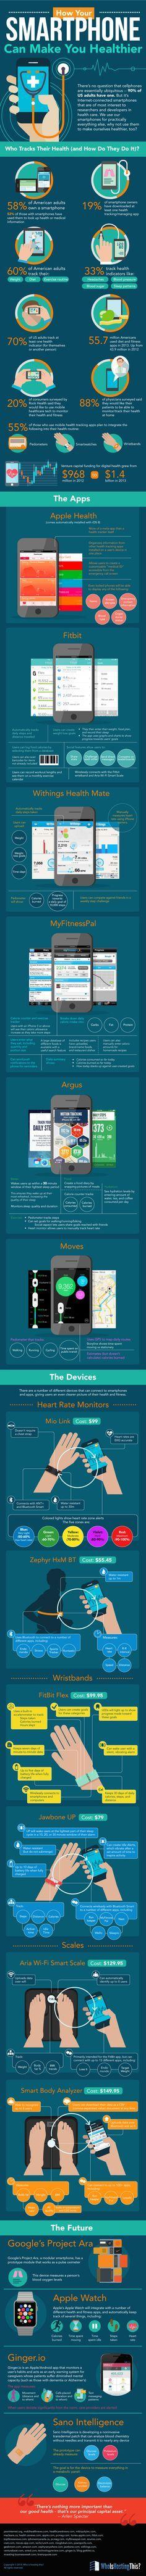 Smartphone make healthier.....